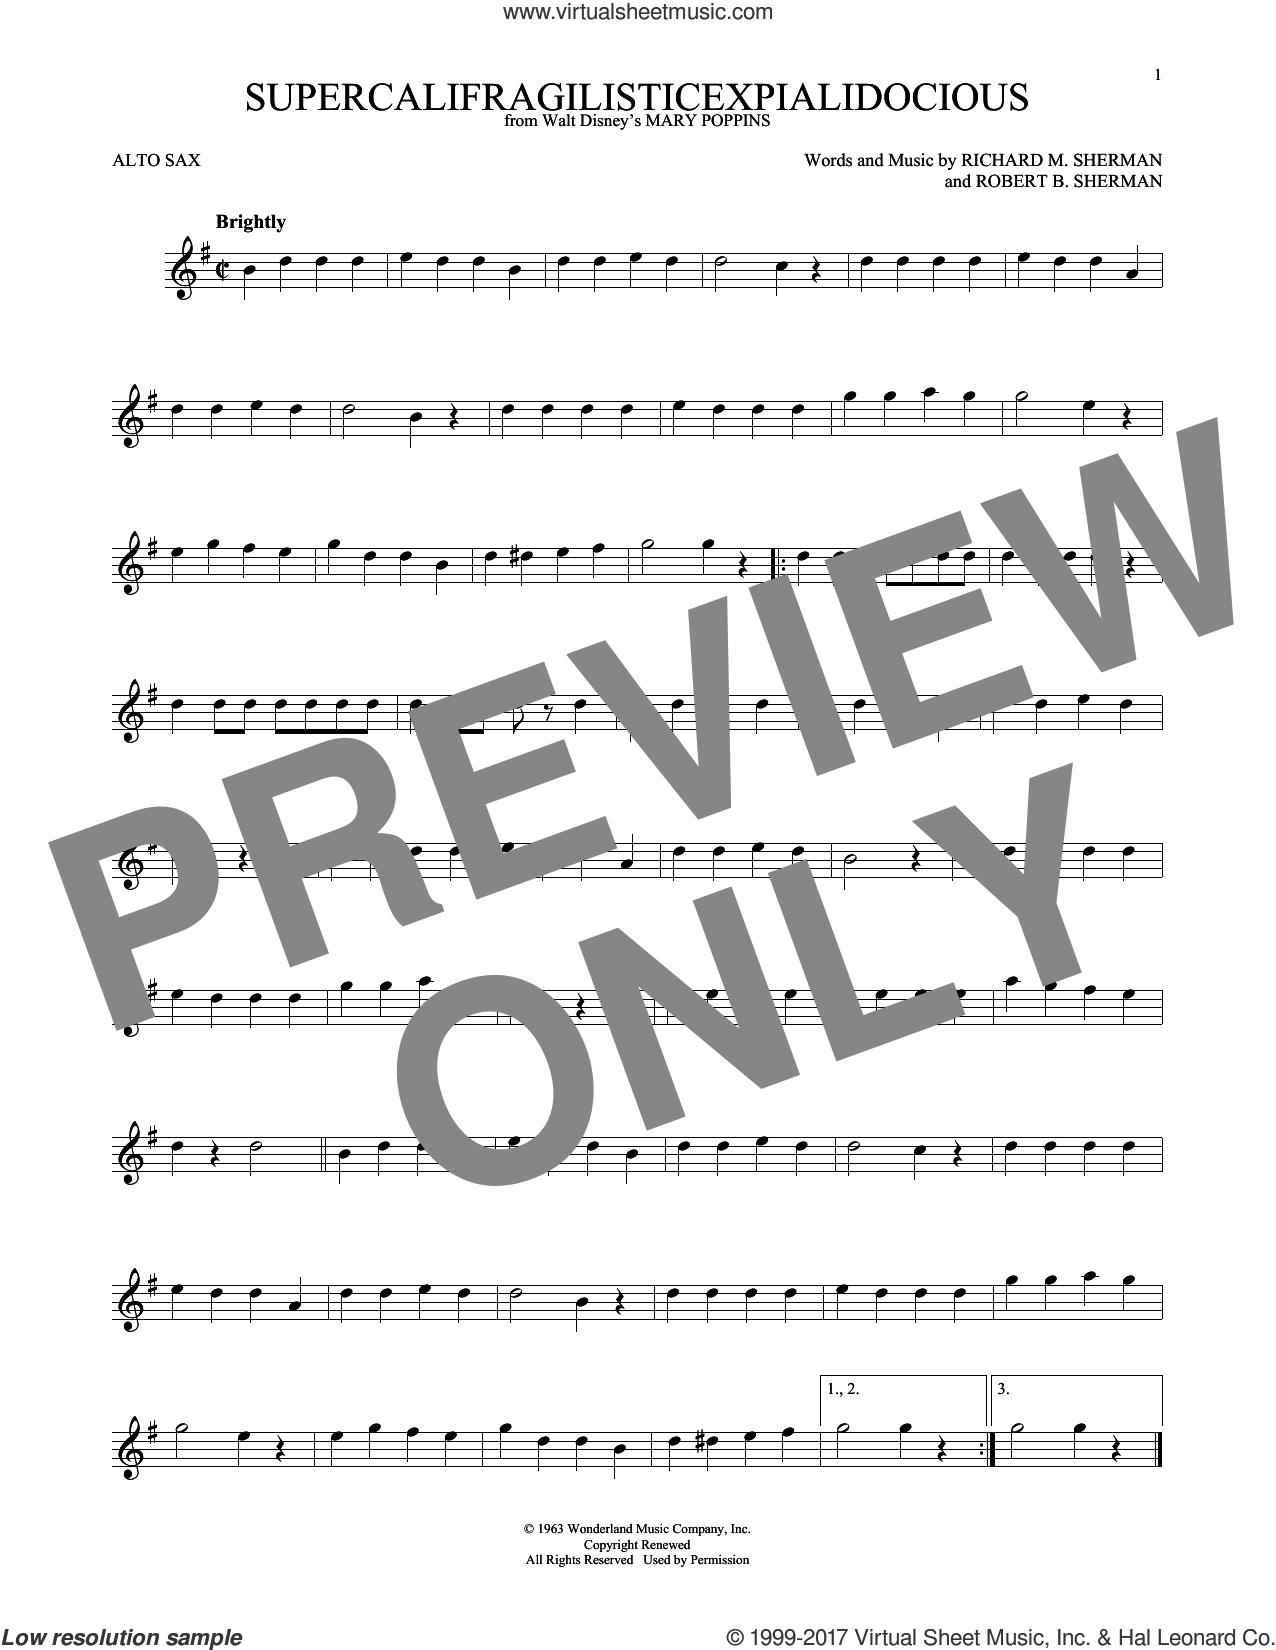 Supercalifragilisticexpialidocious sheet music for alto saxophone solo by Robert B. Sherman and Richard M. Sherman, intermediate skill level